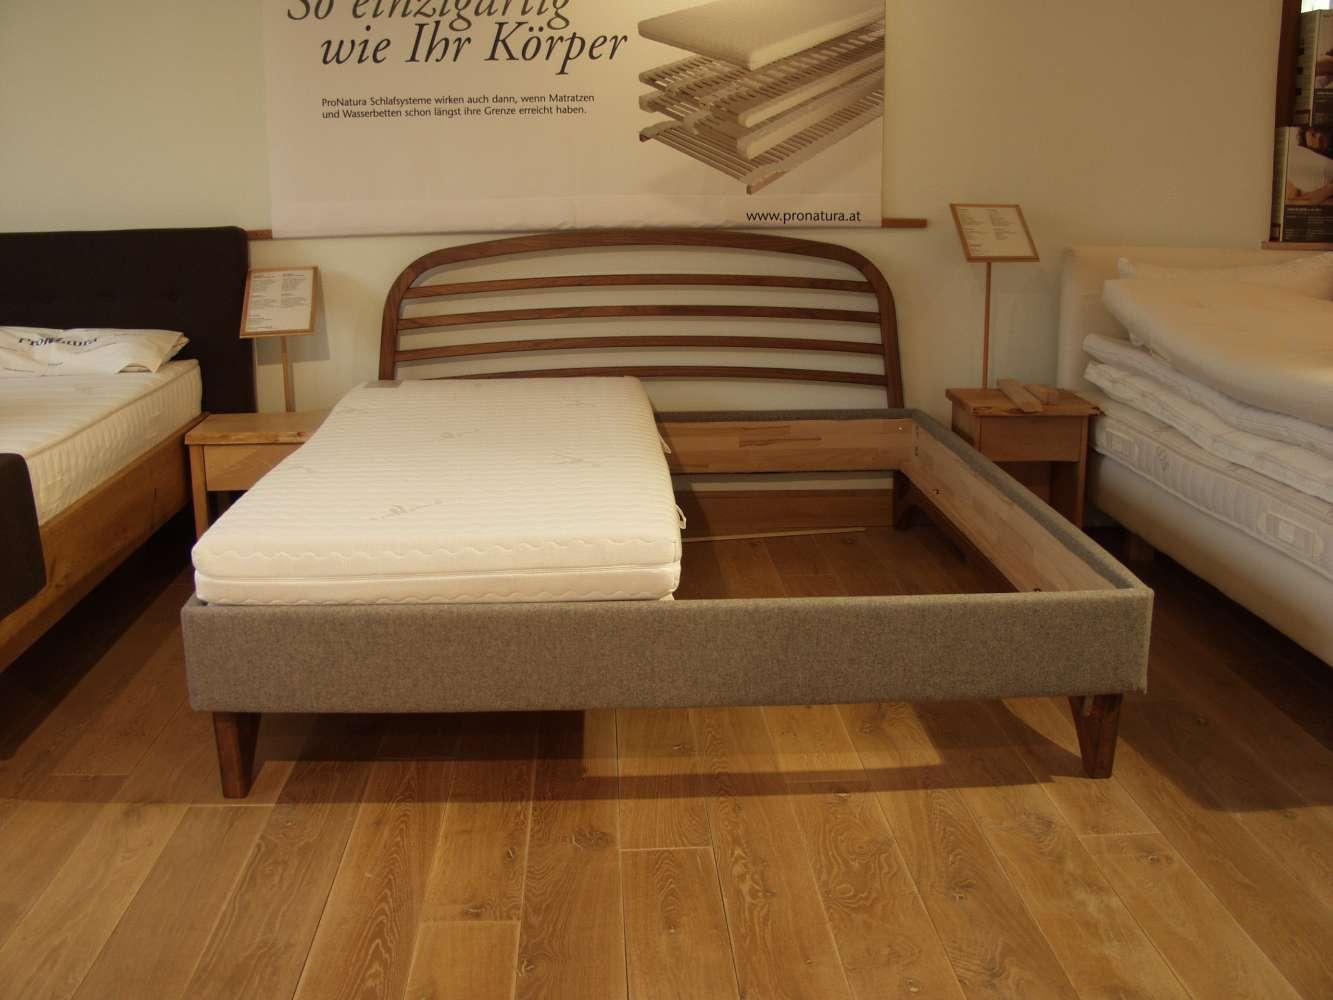 dormiente Bett Livletto 180*200 Nußbaum, Dekobezug Seiten: Earth/Hessian Schurwolle